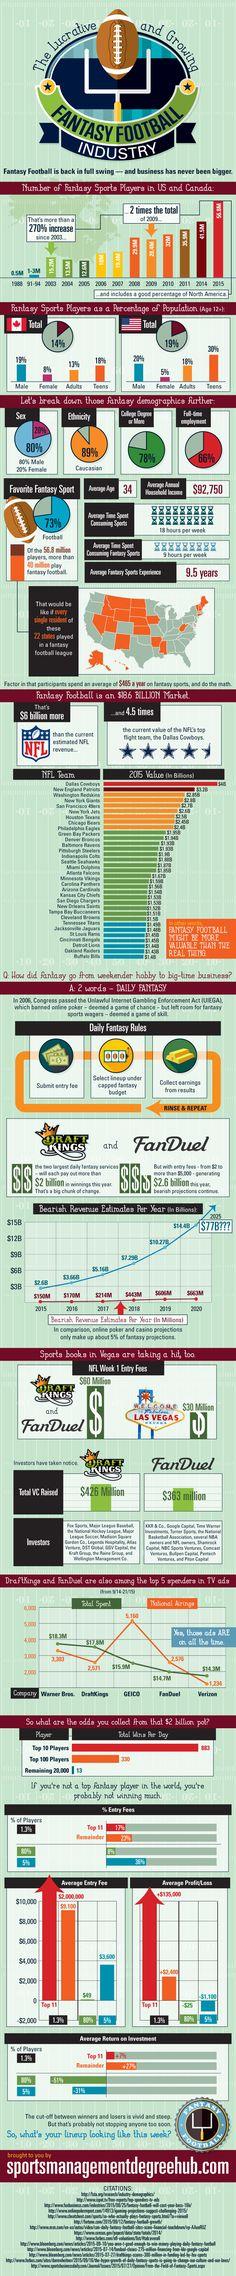 128 Best Sports marketing images   Sports marketing, Sports ... Fanduel Basic Relay Wiring Diagram on